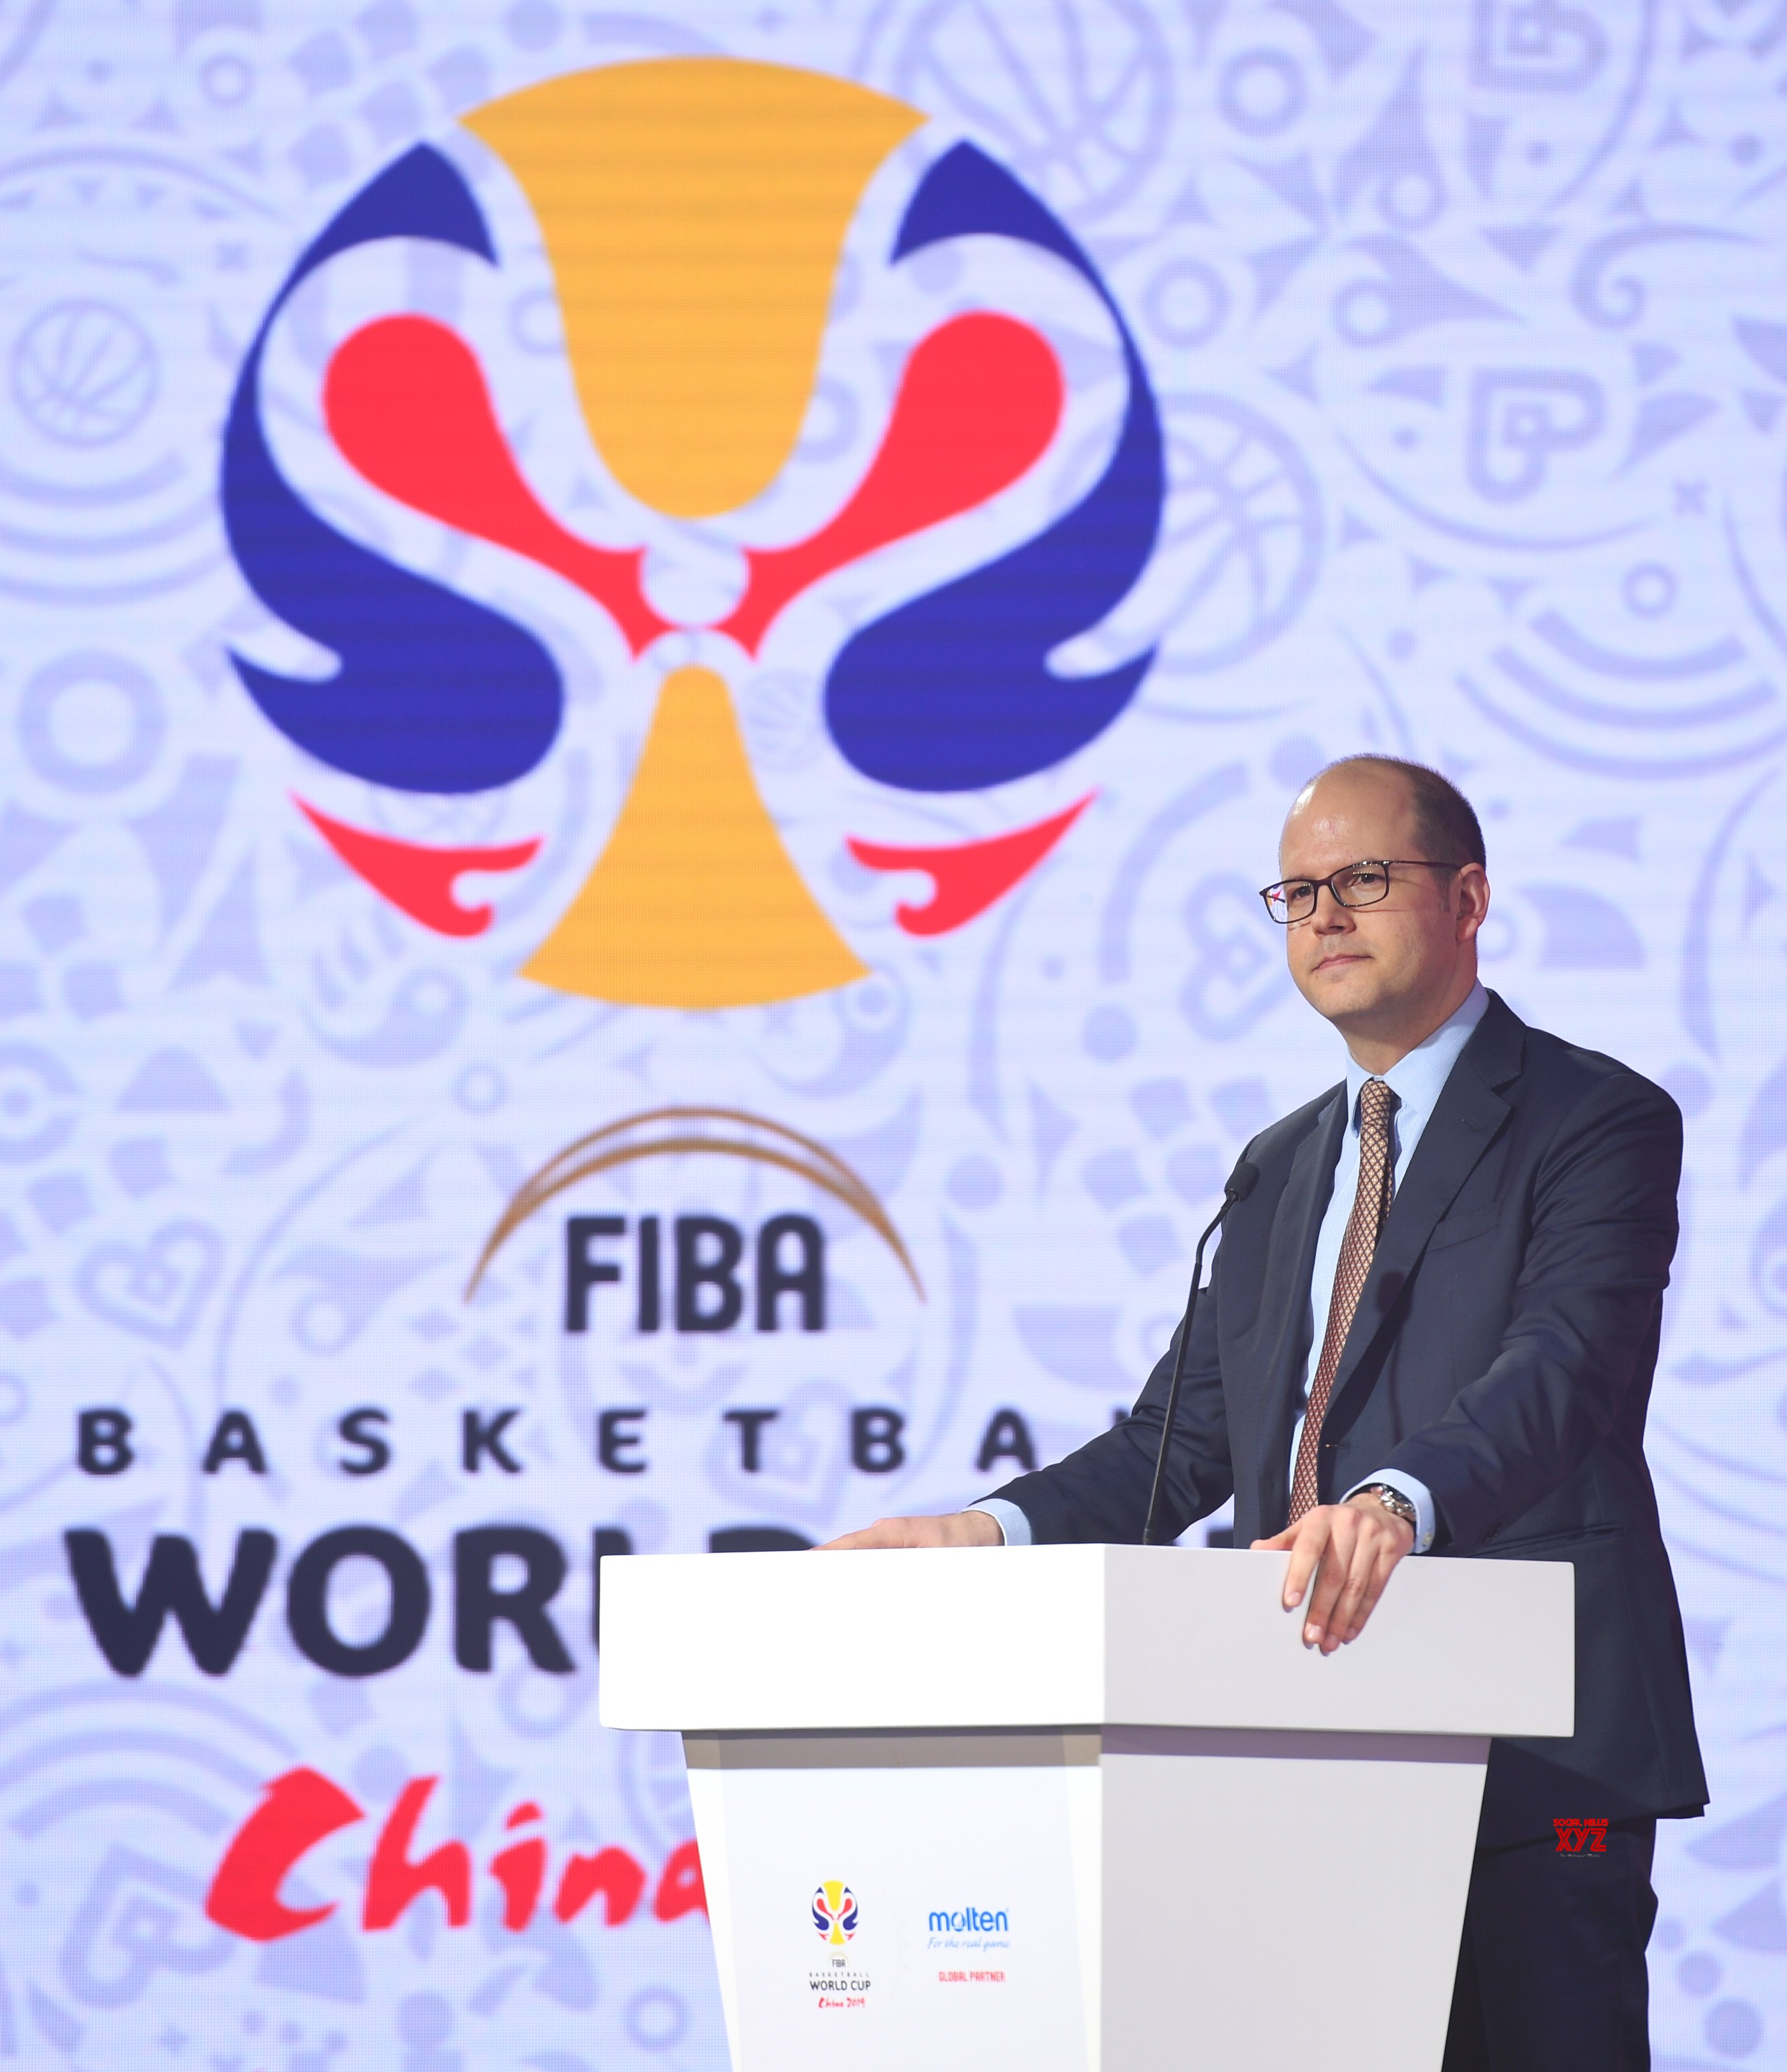 CHINA - SHENZHEN - BASKETBALL - FIBA 2019 WORLD CUP - OFFICIAL BALL #Gallery